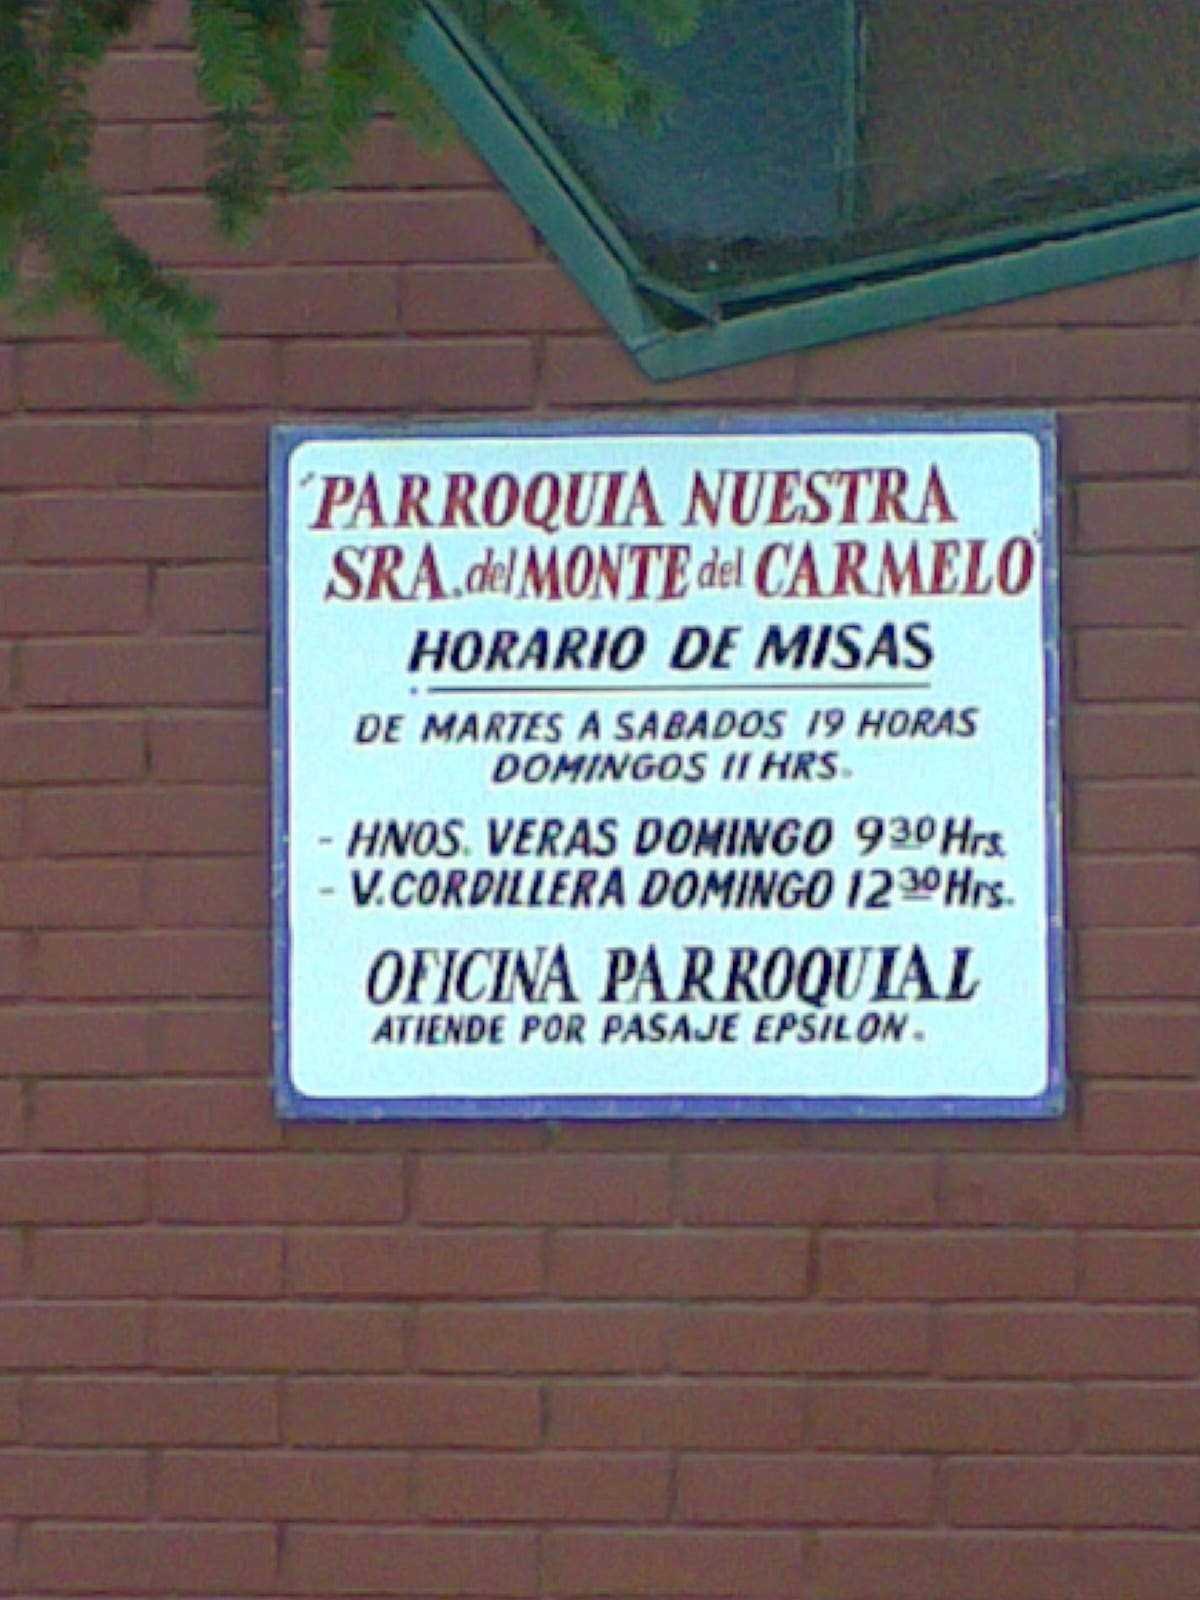 Parroquias y capillas de rancagua for Horario de oficina correos